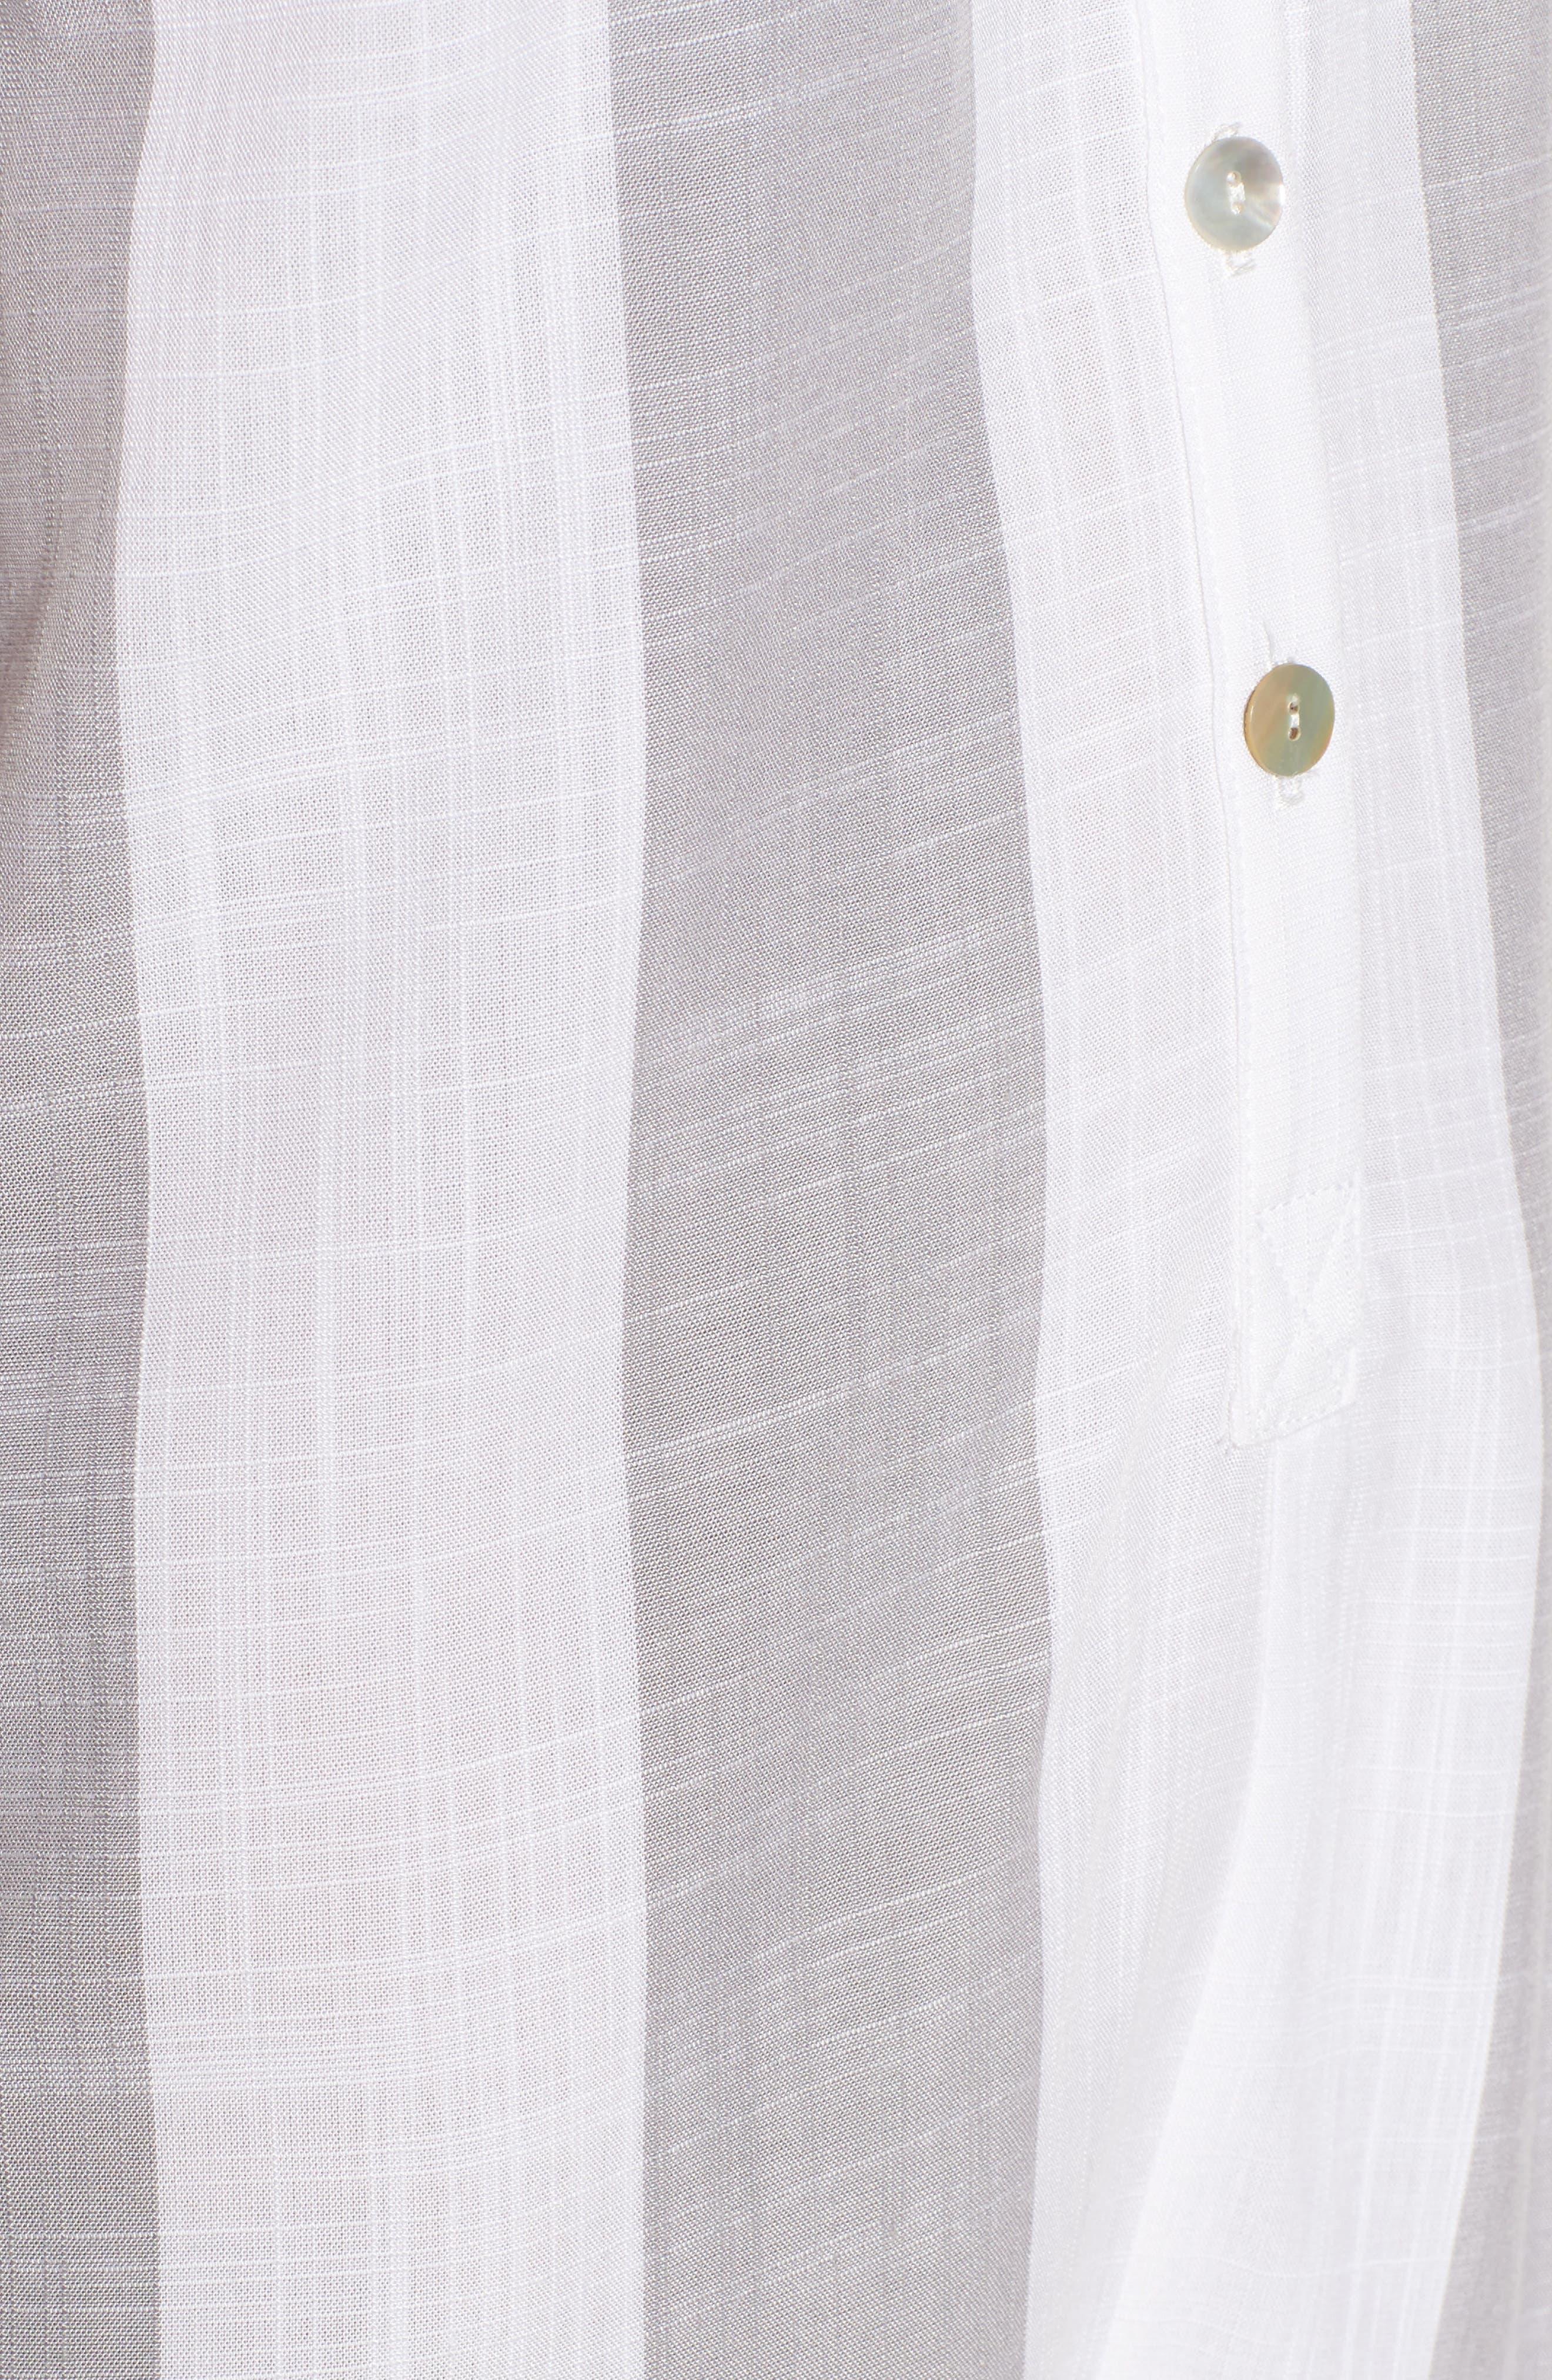 Ellie Romper,                             Alternate thumbnail 5, color,                             Grey Bengal Stripe